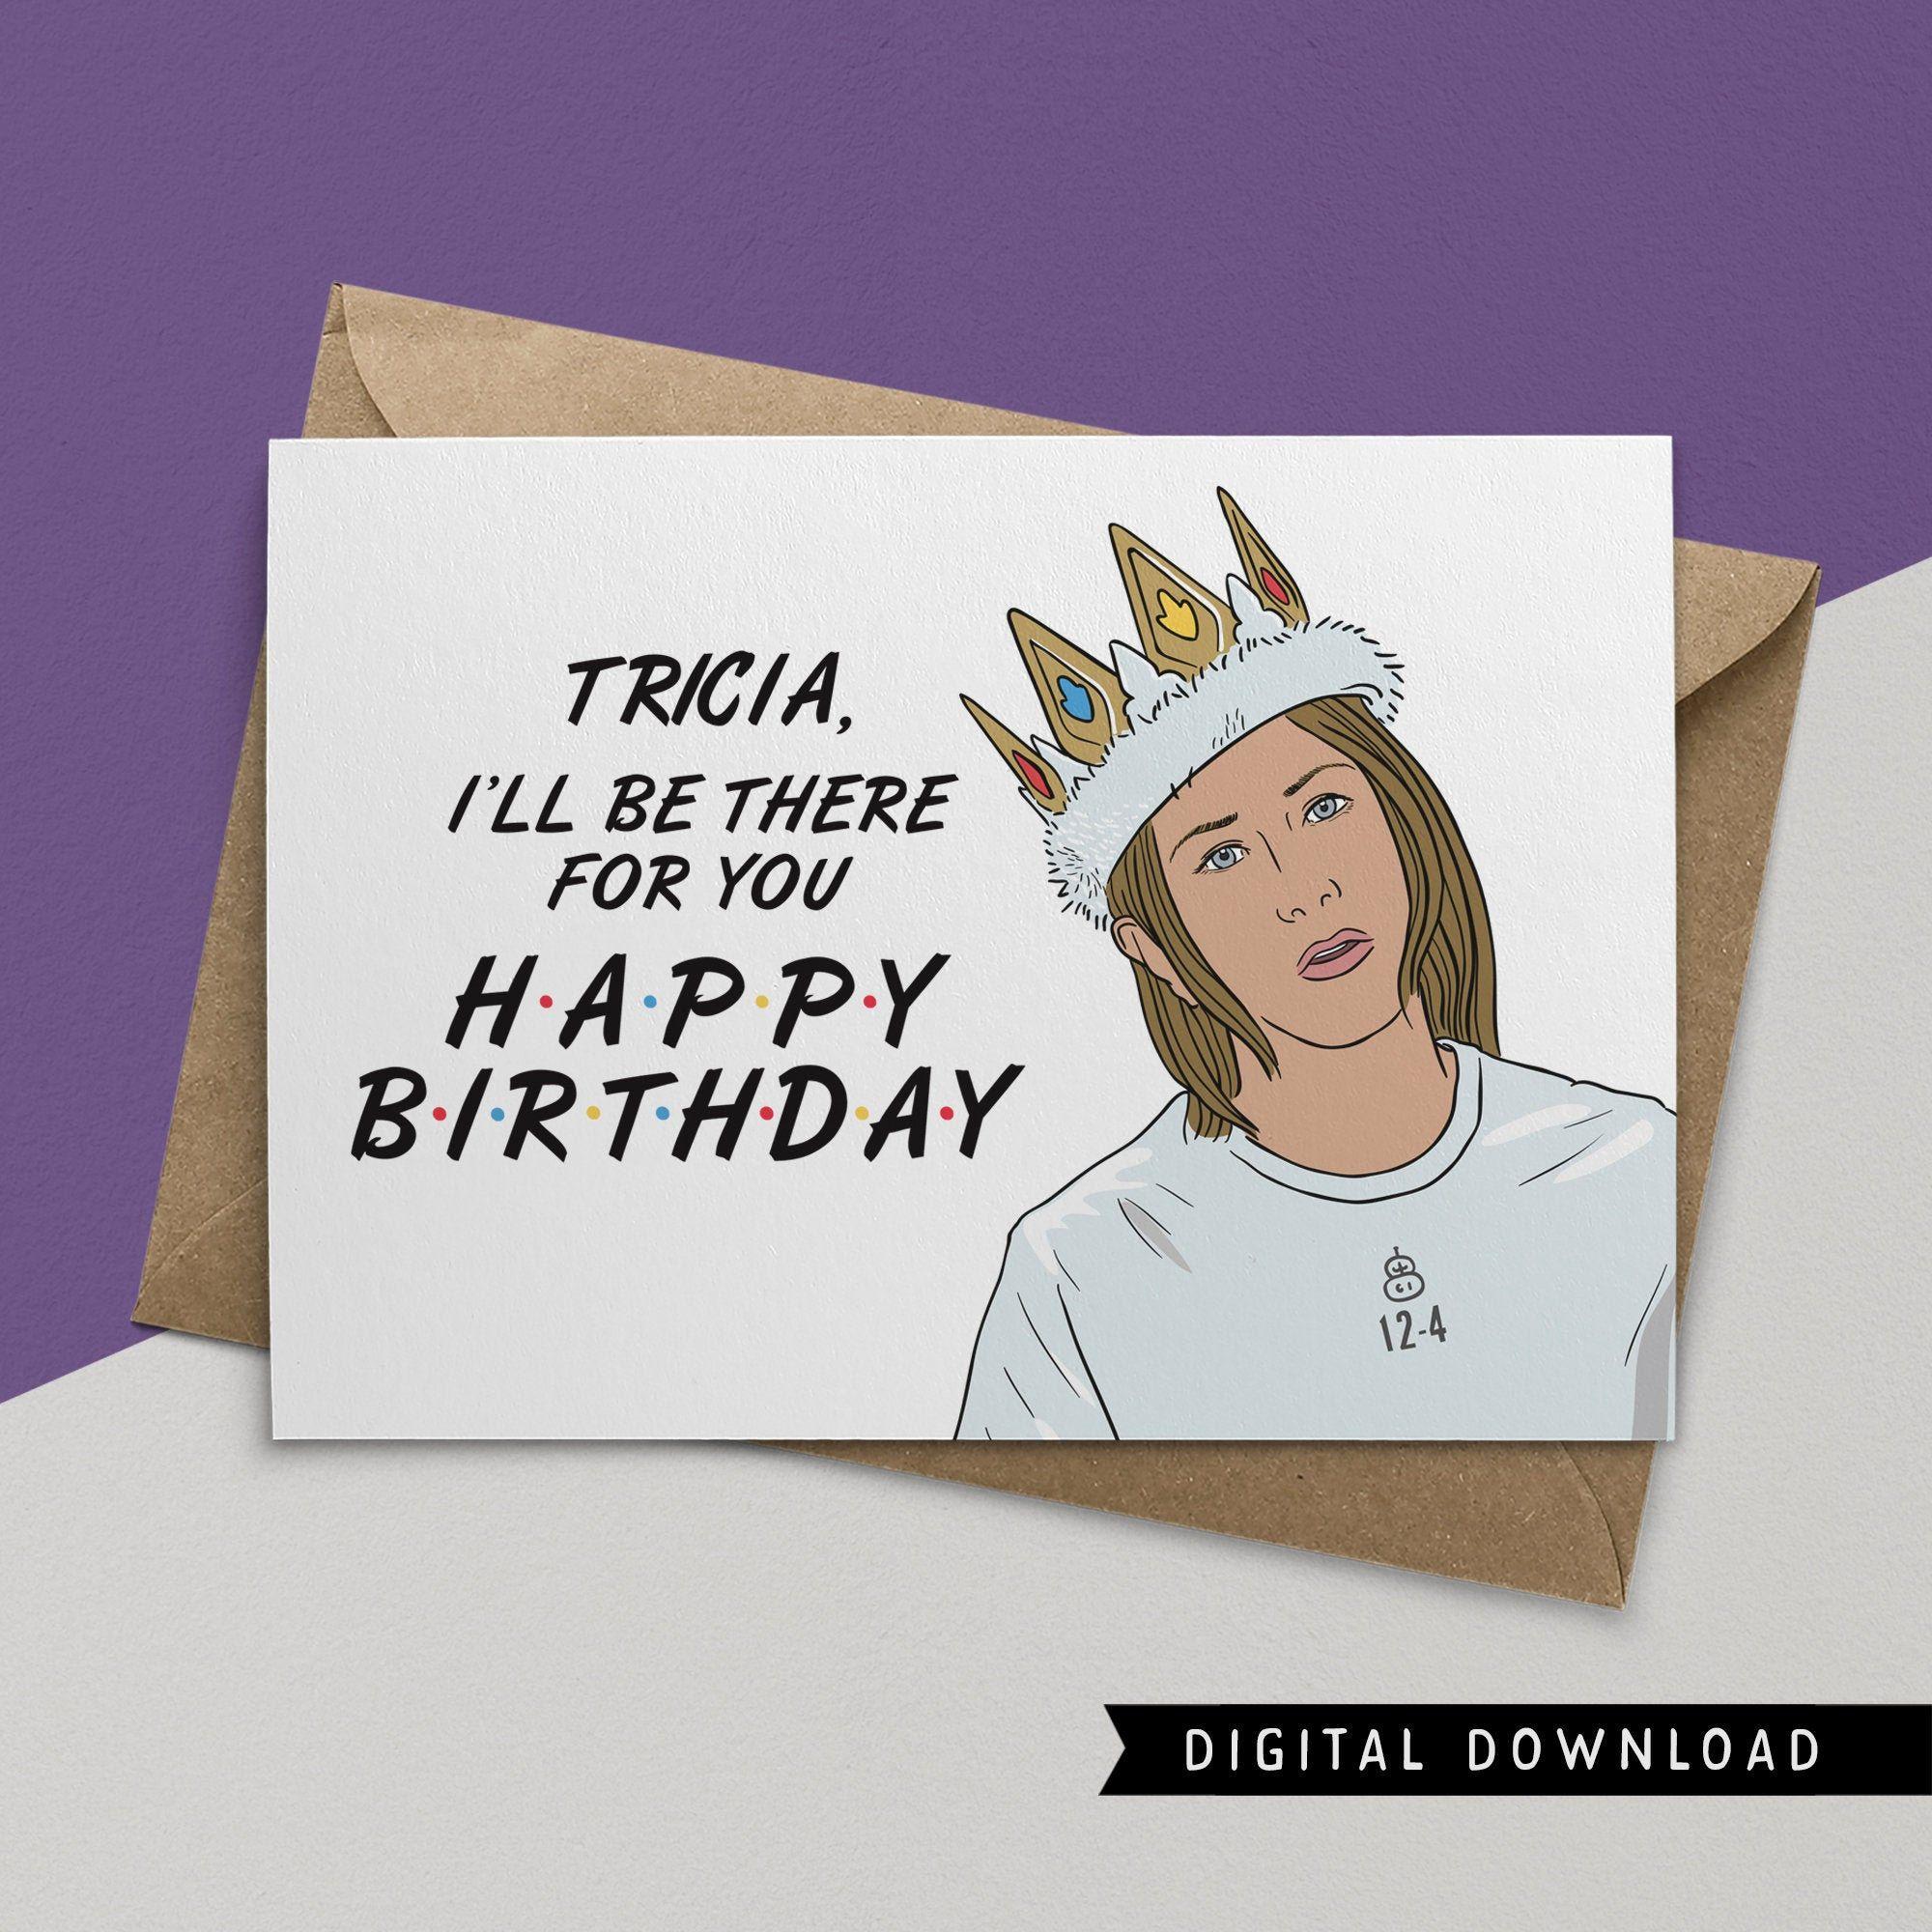 Buy 1 Get 1 Free Printable Birthday Card Instant Download Etsy In 2021 Birthday Card Printable Funny Birthday Cards Happy Birthday Cards